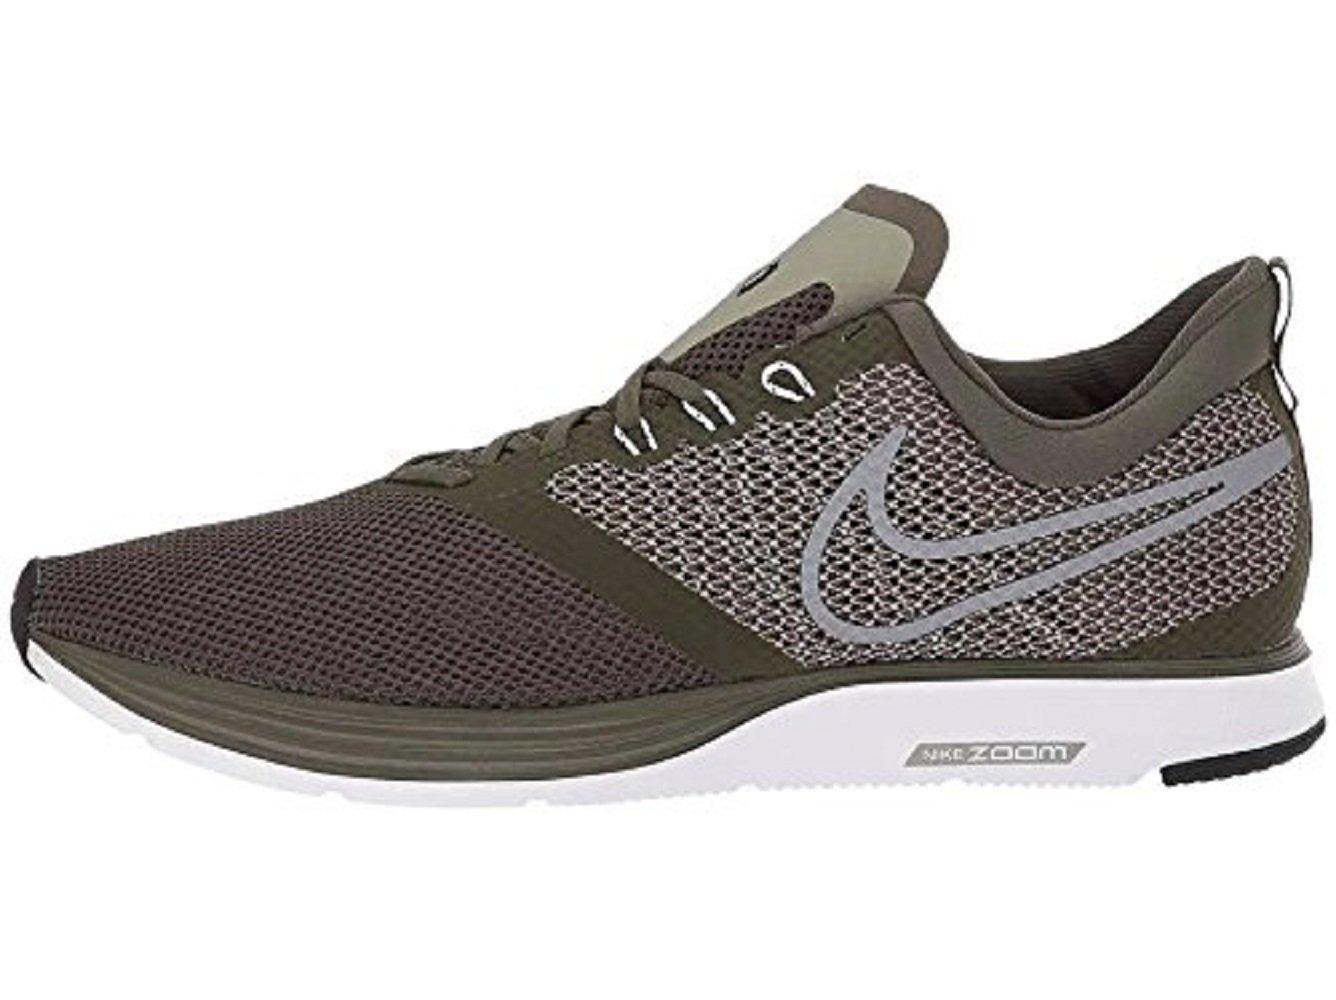 NIKE Women's Zoom Strike Running Shoe B071Z2M644 9.5 D(M) US|Cargo Khaki/Cool Grey